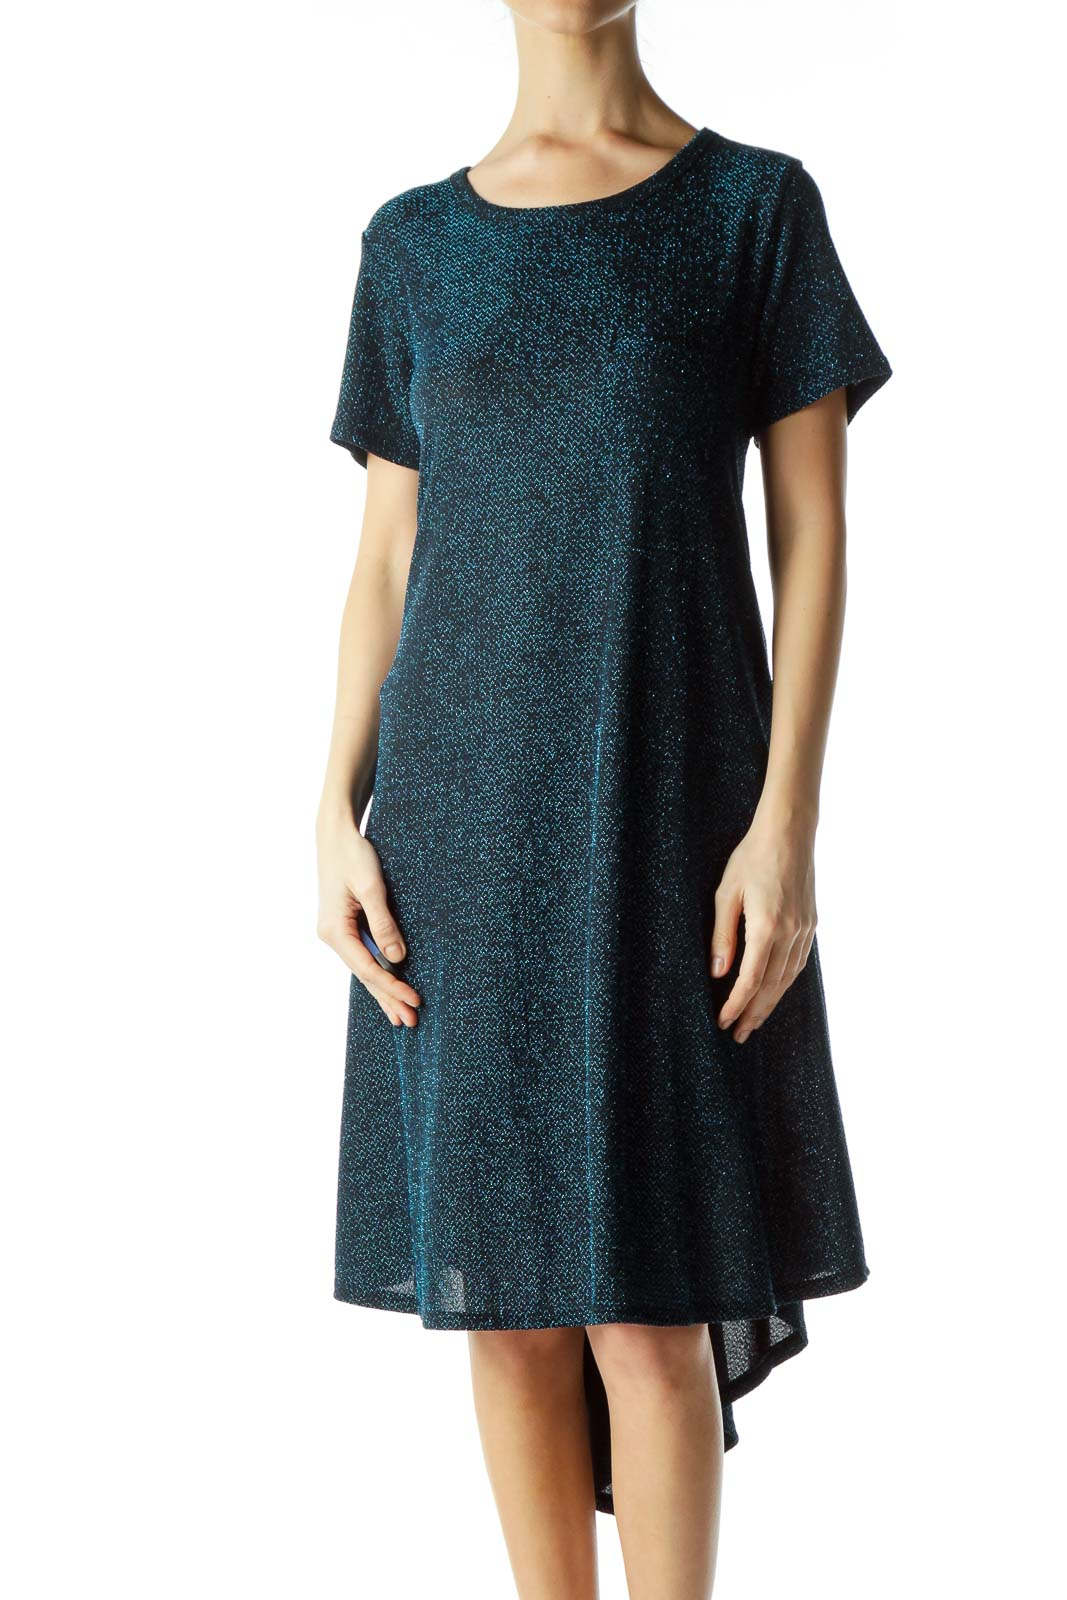 Black Blue Metallic Tent Dress